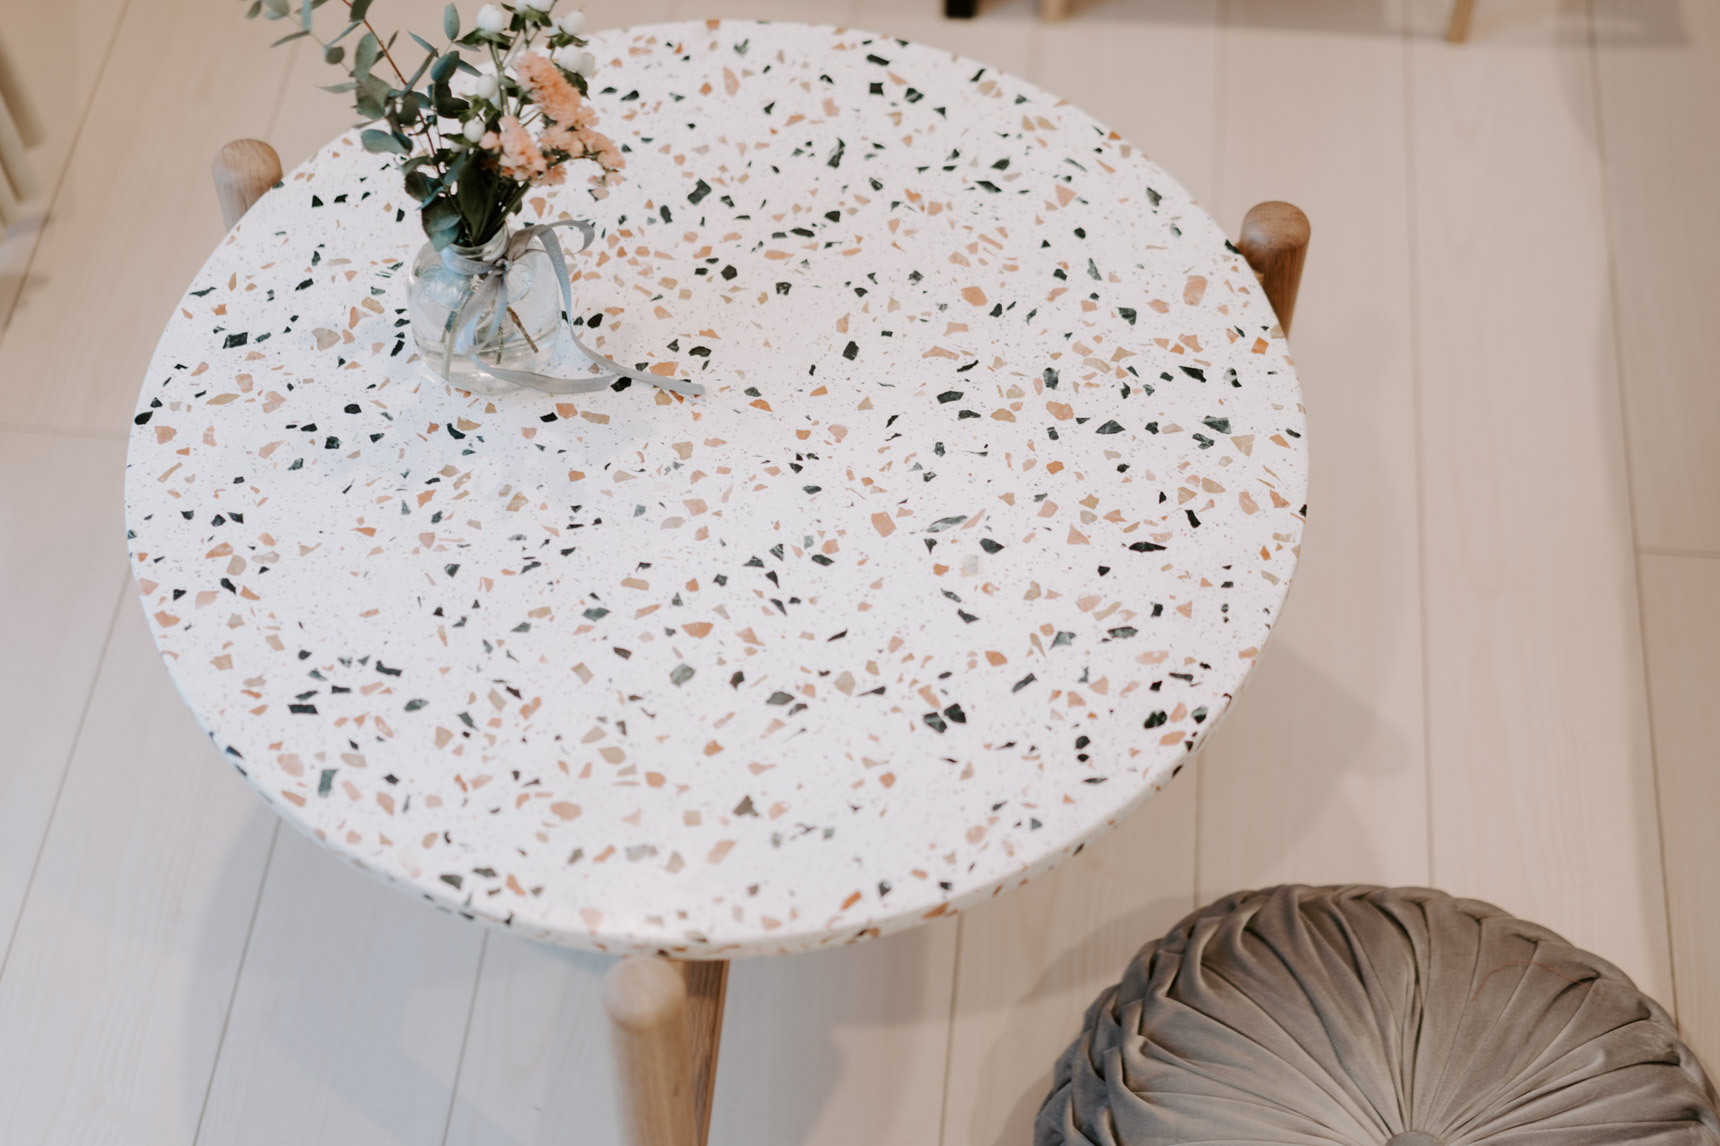 FrancFrancで買ったローテーブルは、引っ越す時に一番最初に決めたもの。柄の入ったテーブル、お部屋のアクセントになってとても素敵です。